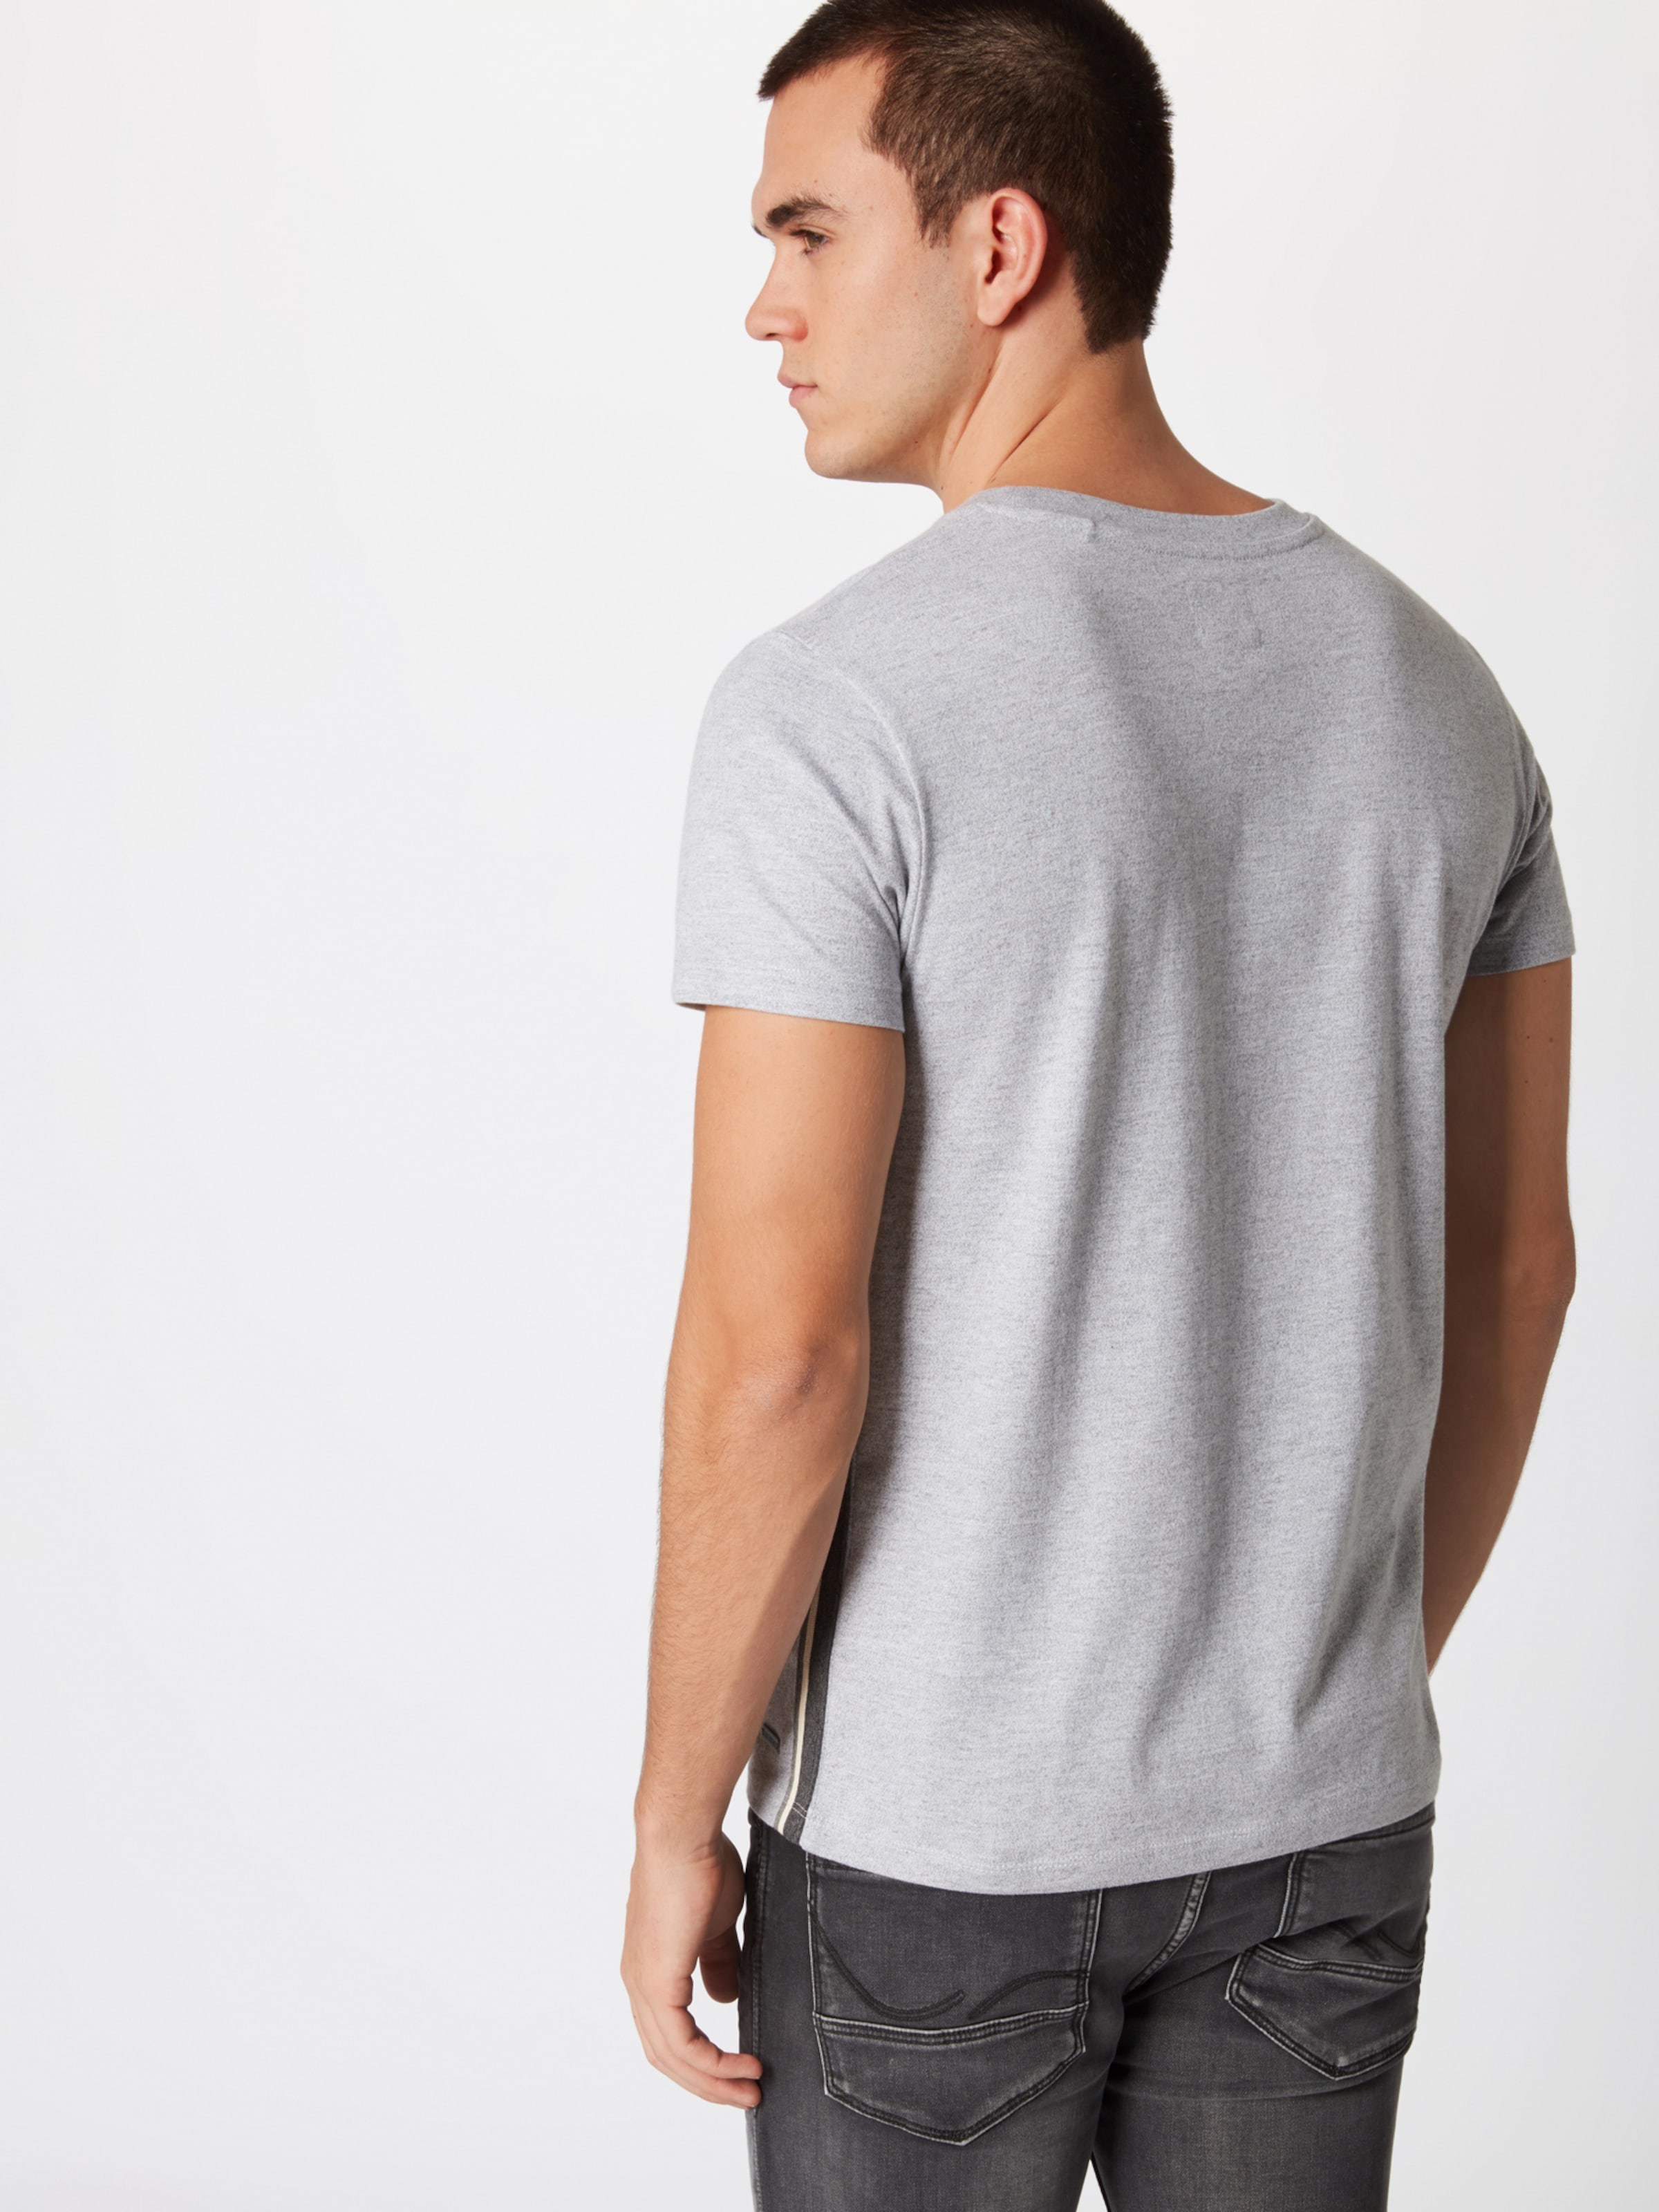 'sg 128cc2k026' Edc In Esprit By Shirt Grau Nm0wOnv8